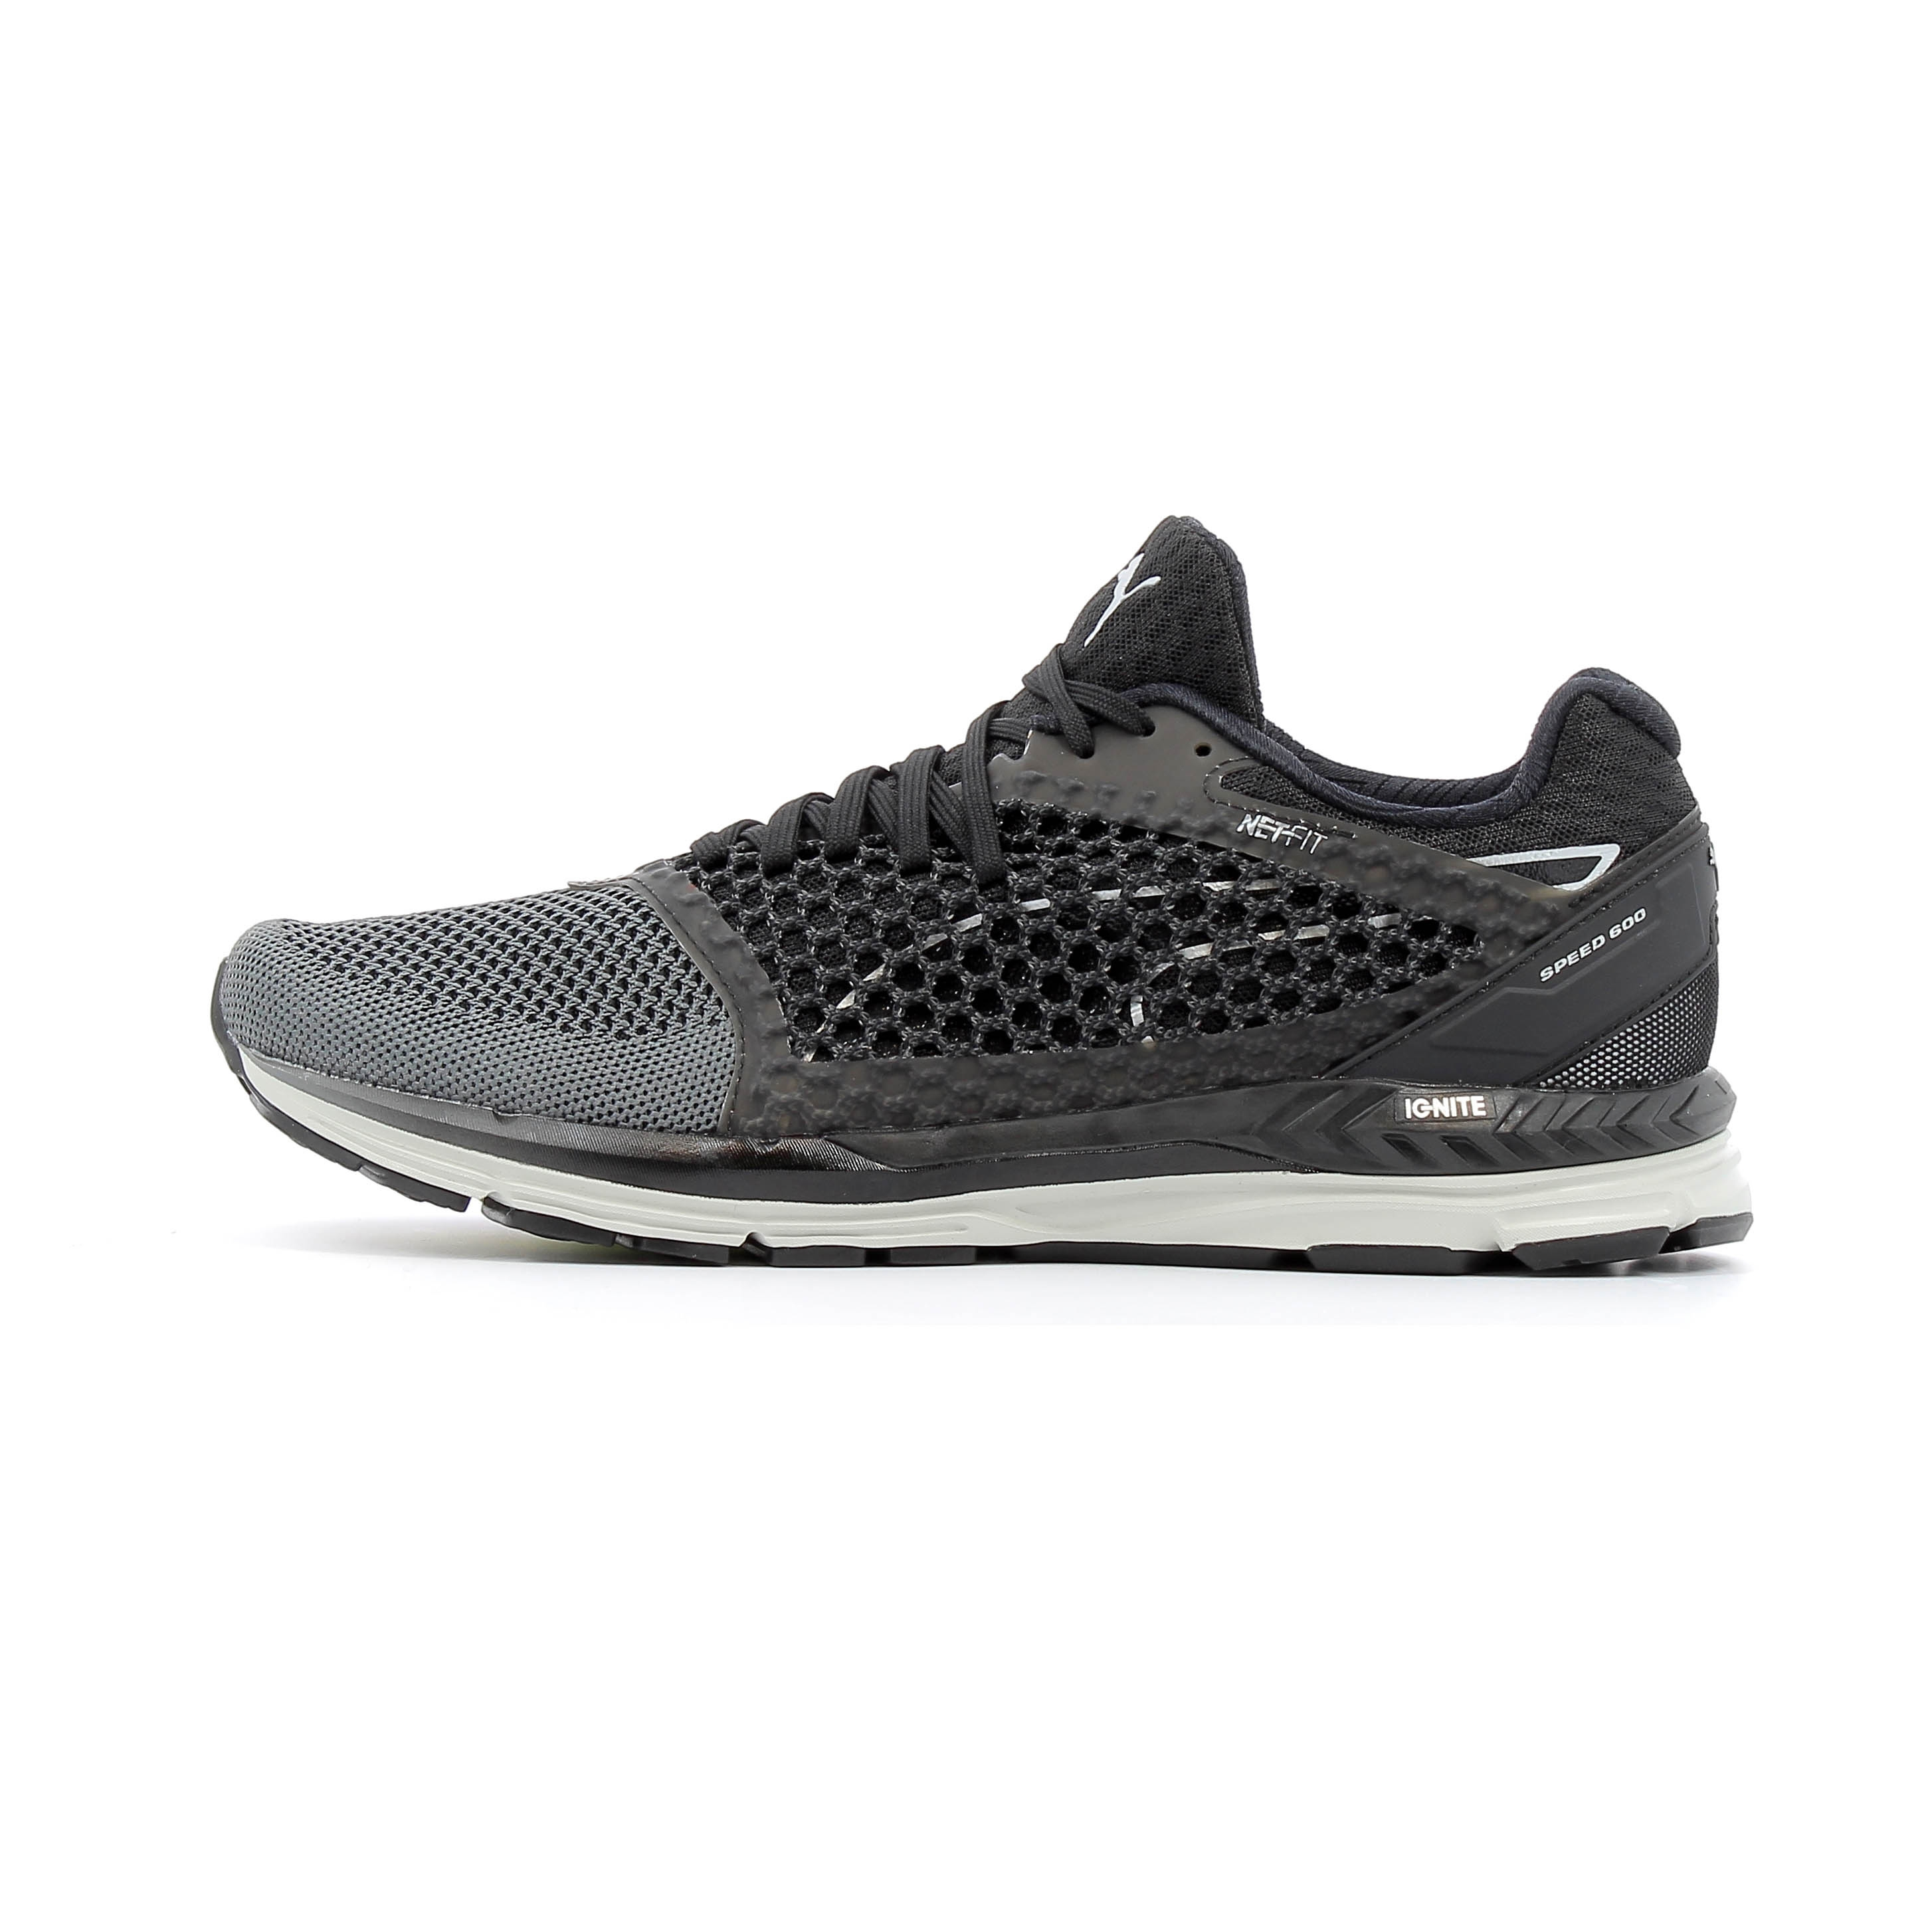 Puma Speed 600 Ignite 3 Chaussures running pour Homme Noir